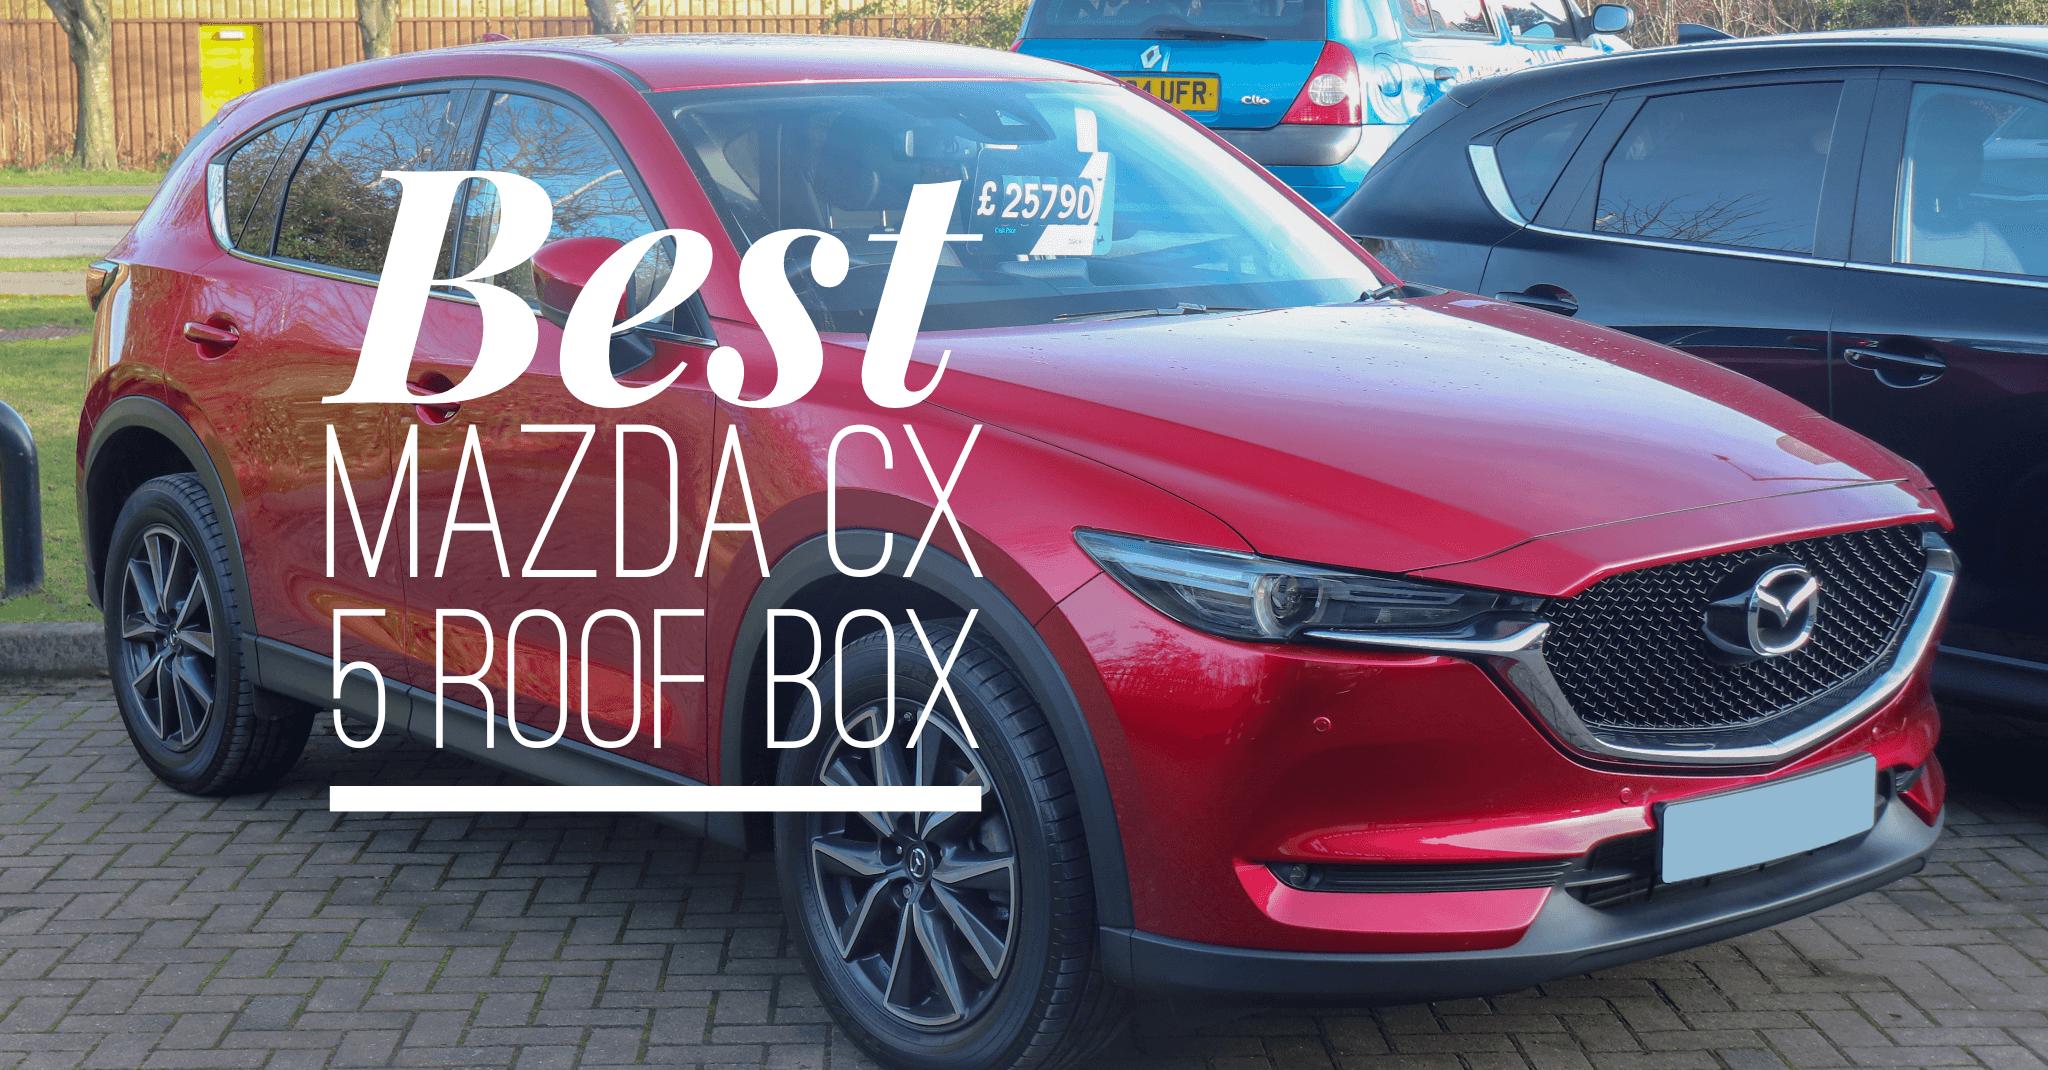 Best roof box mazda cx 5